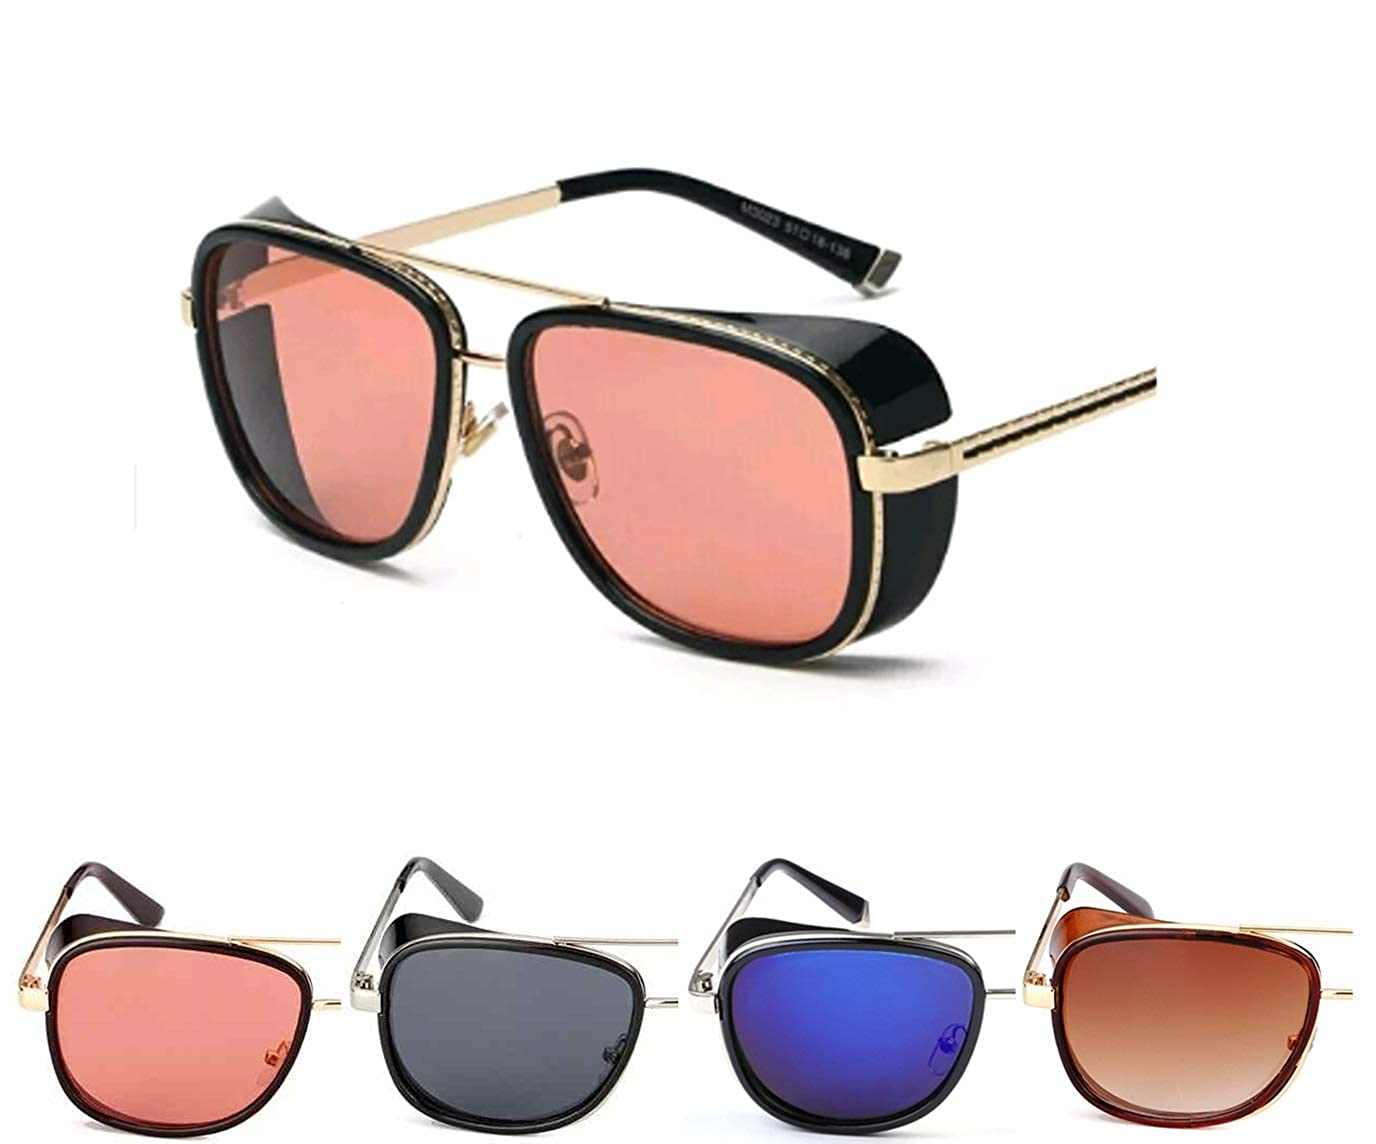 b844dc284db 50 Shades Unisex Tony Stark Iron Man Aviator Steampunk Retro Vintage  Sunglasses (Brown